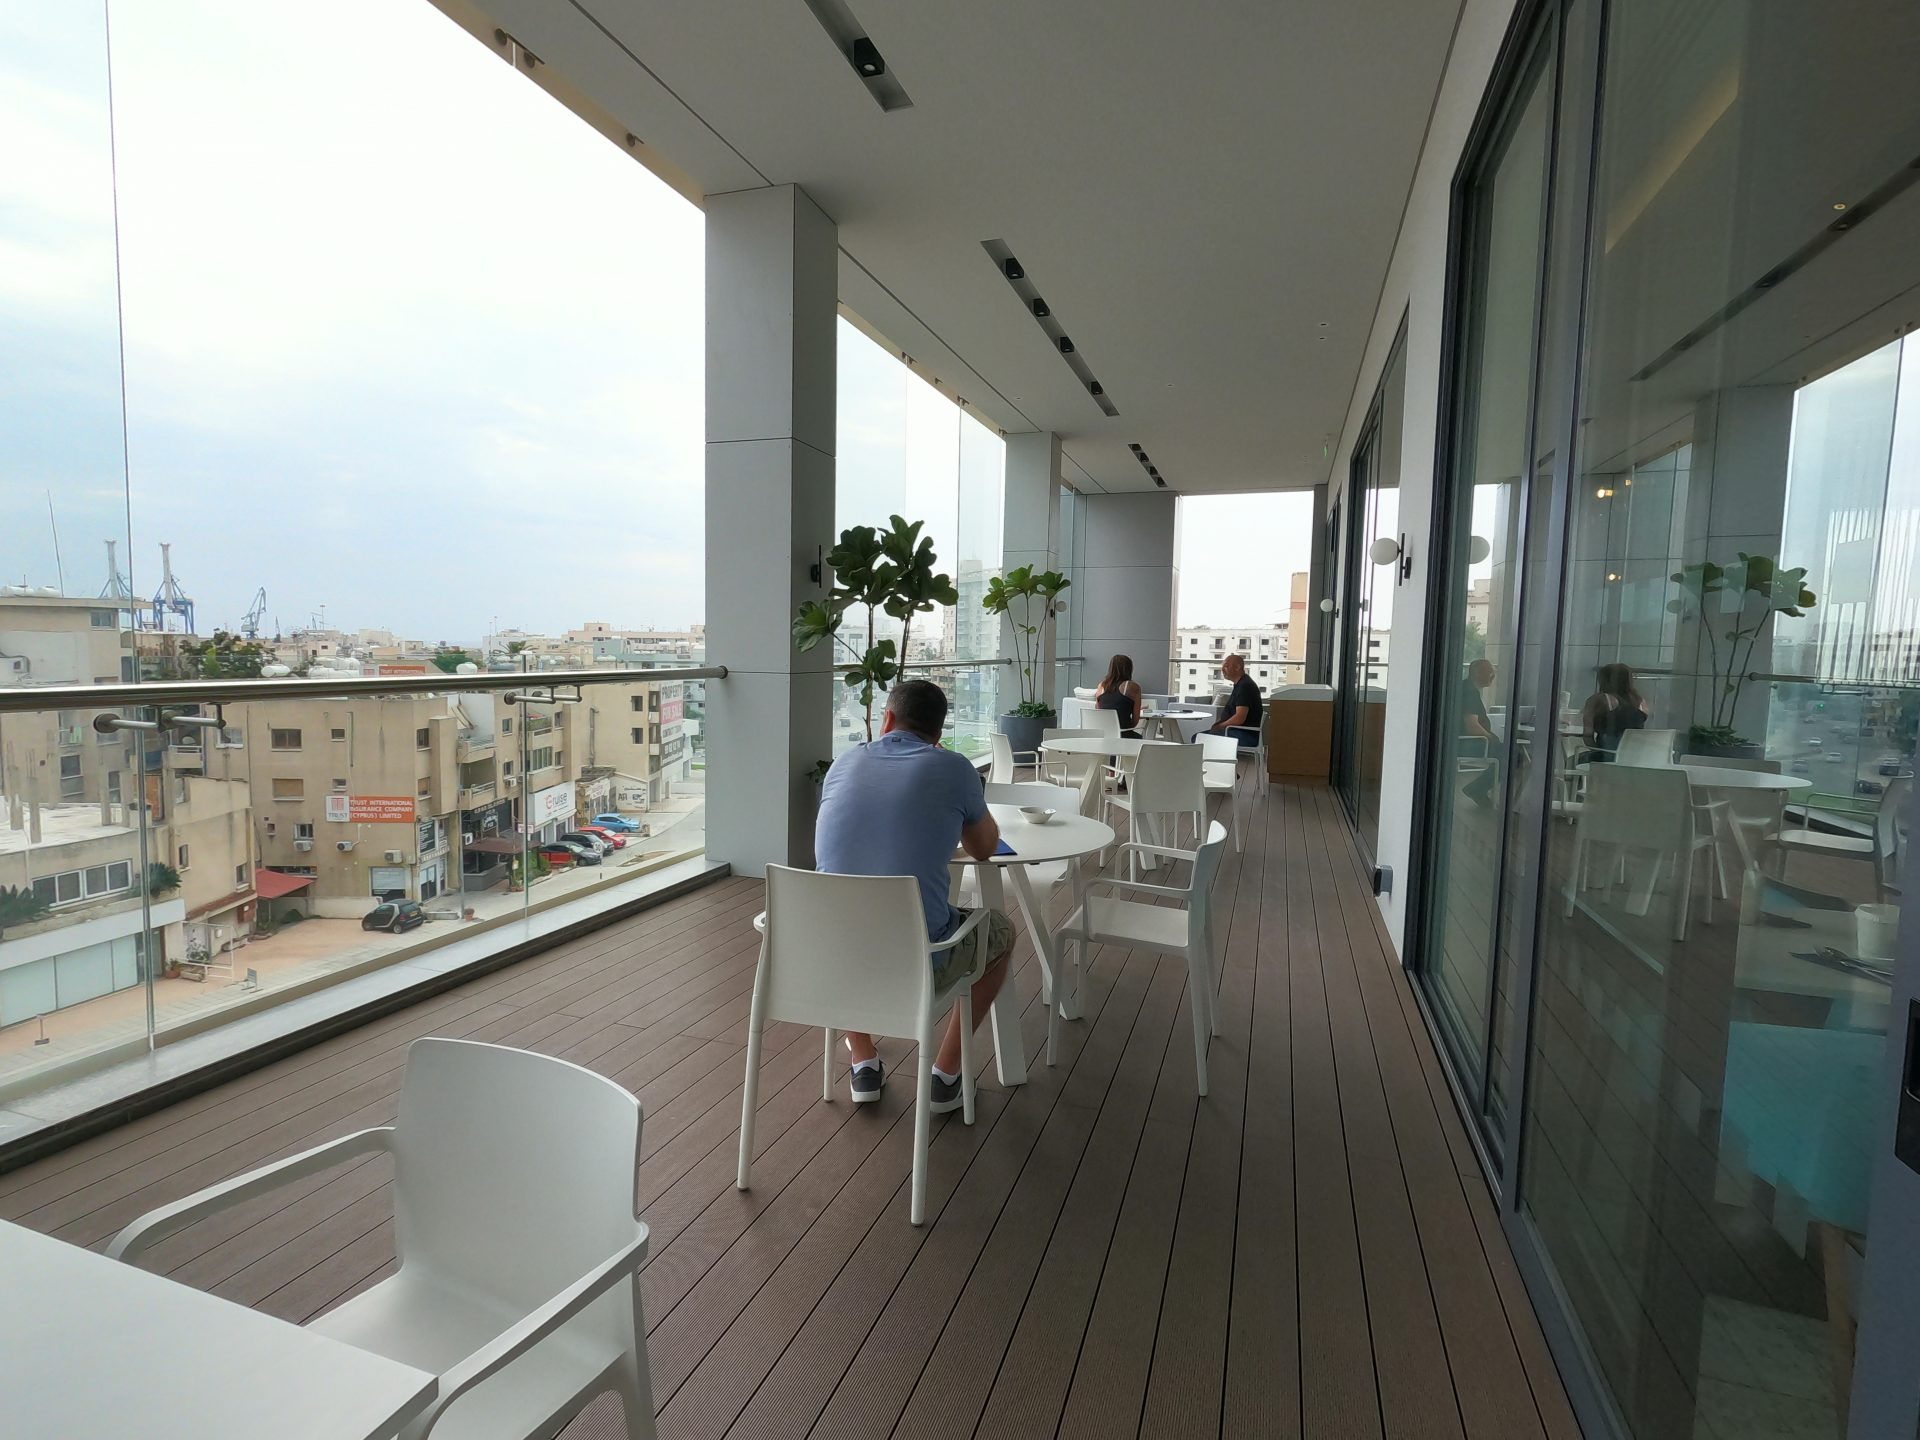 The outdoor balcony